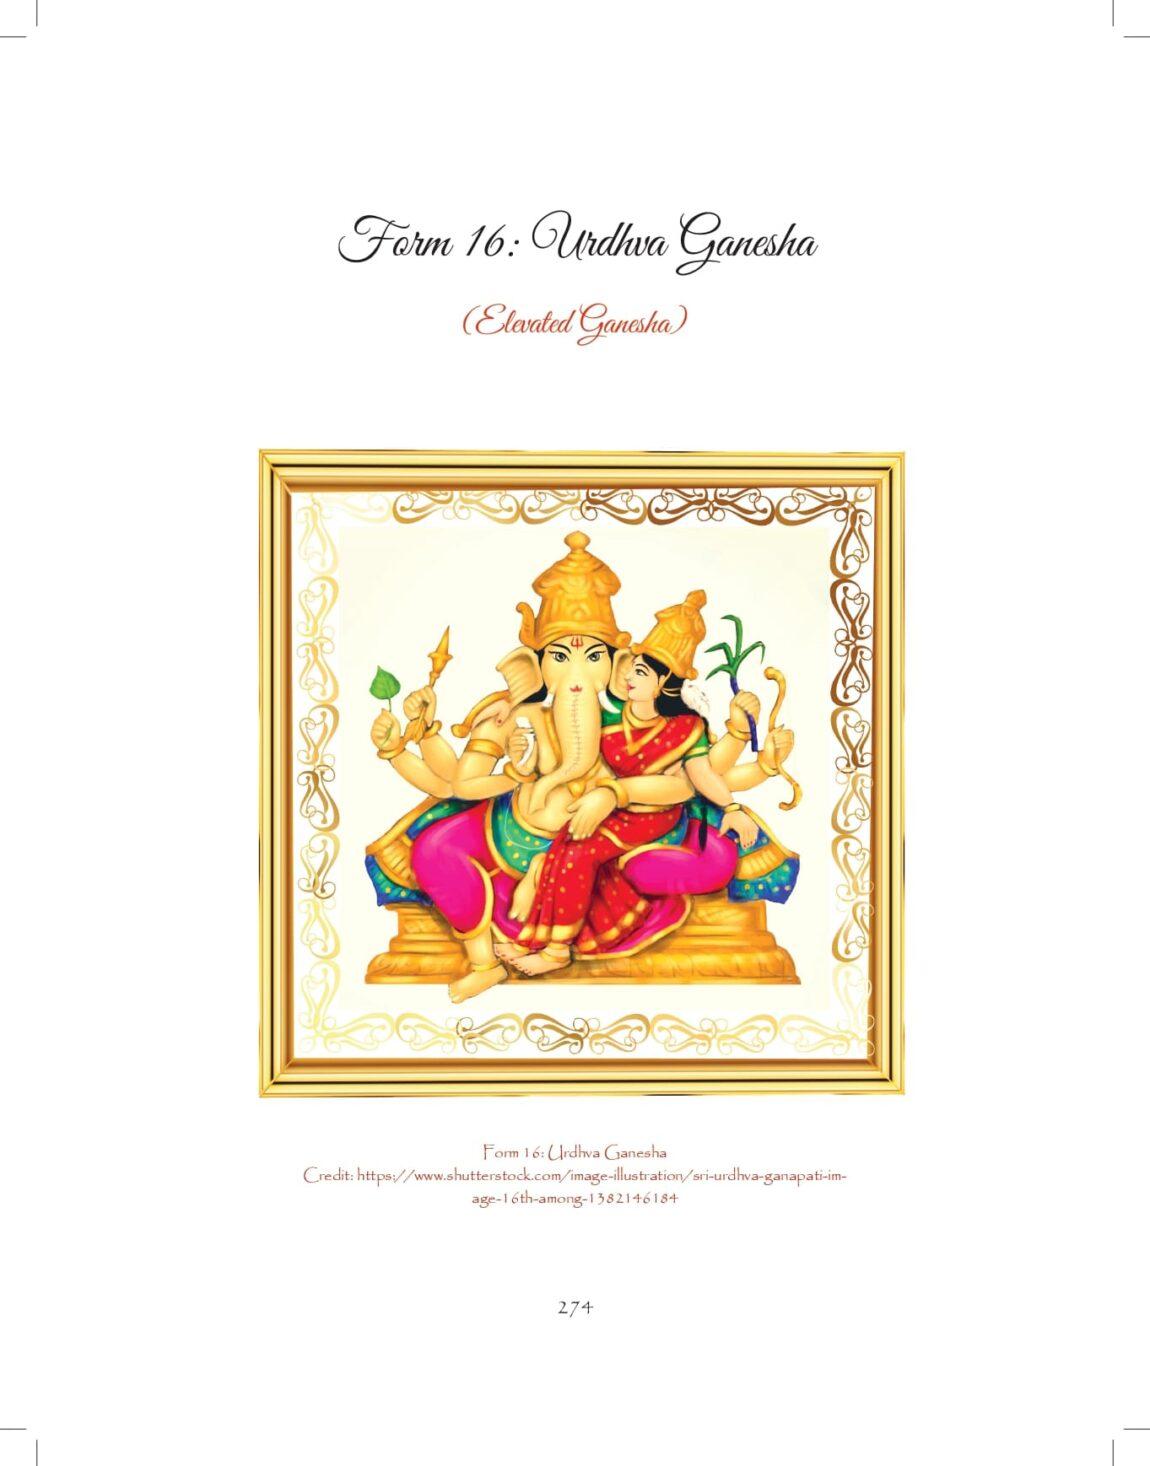 Ganesh-print_pages-to-jpg-0274.jpg